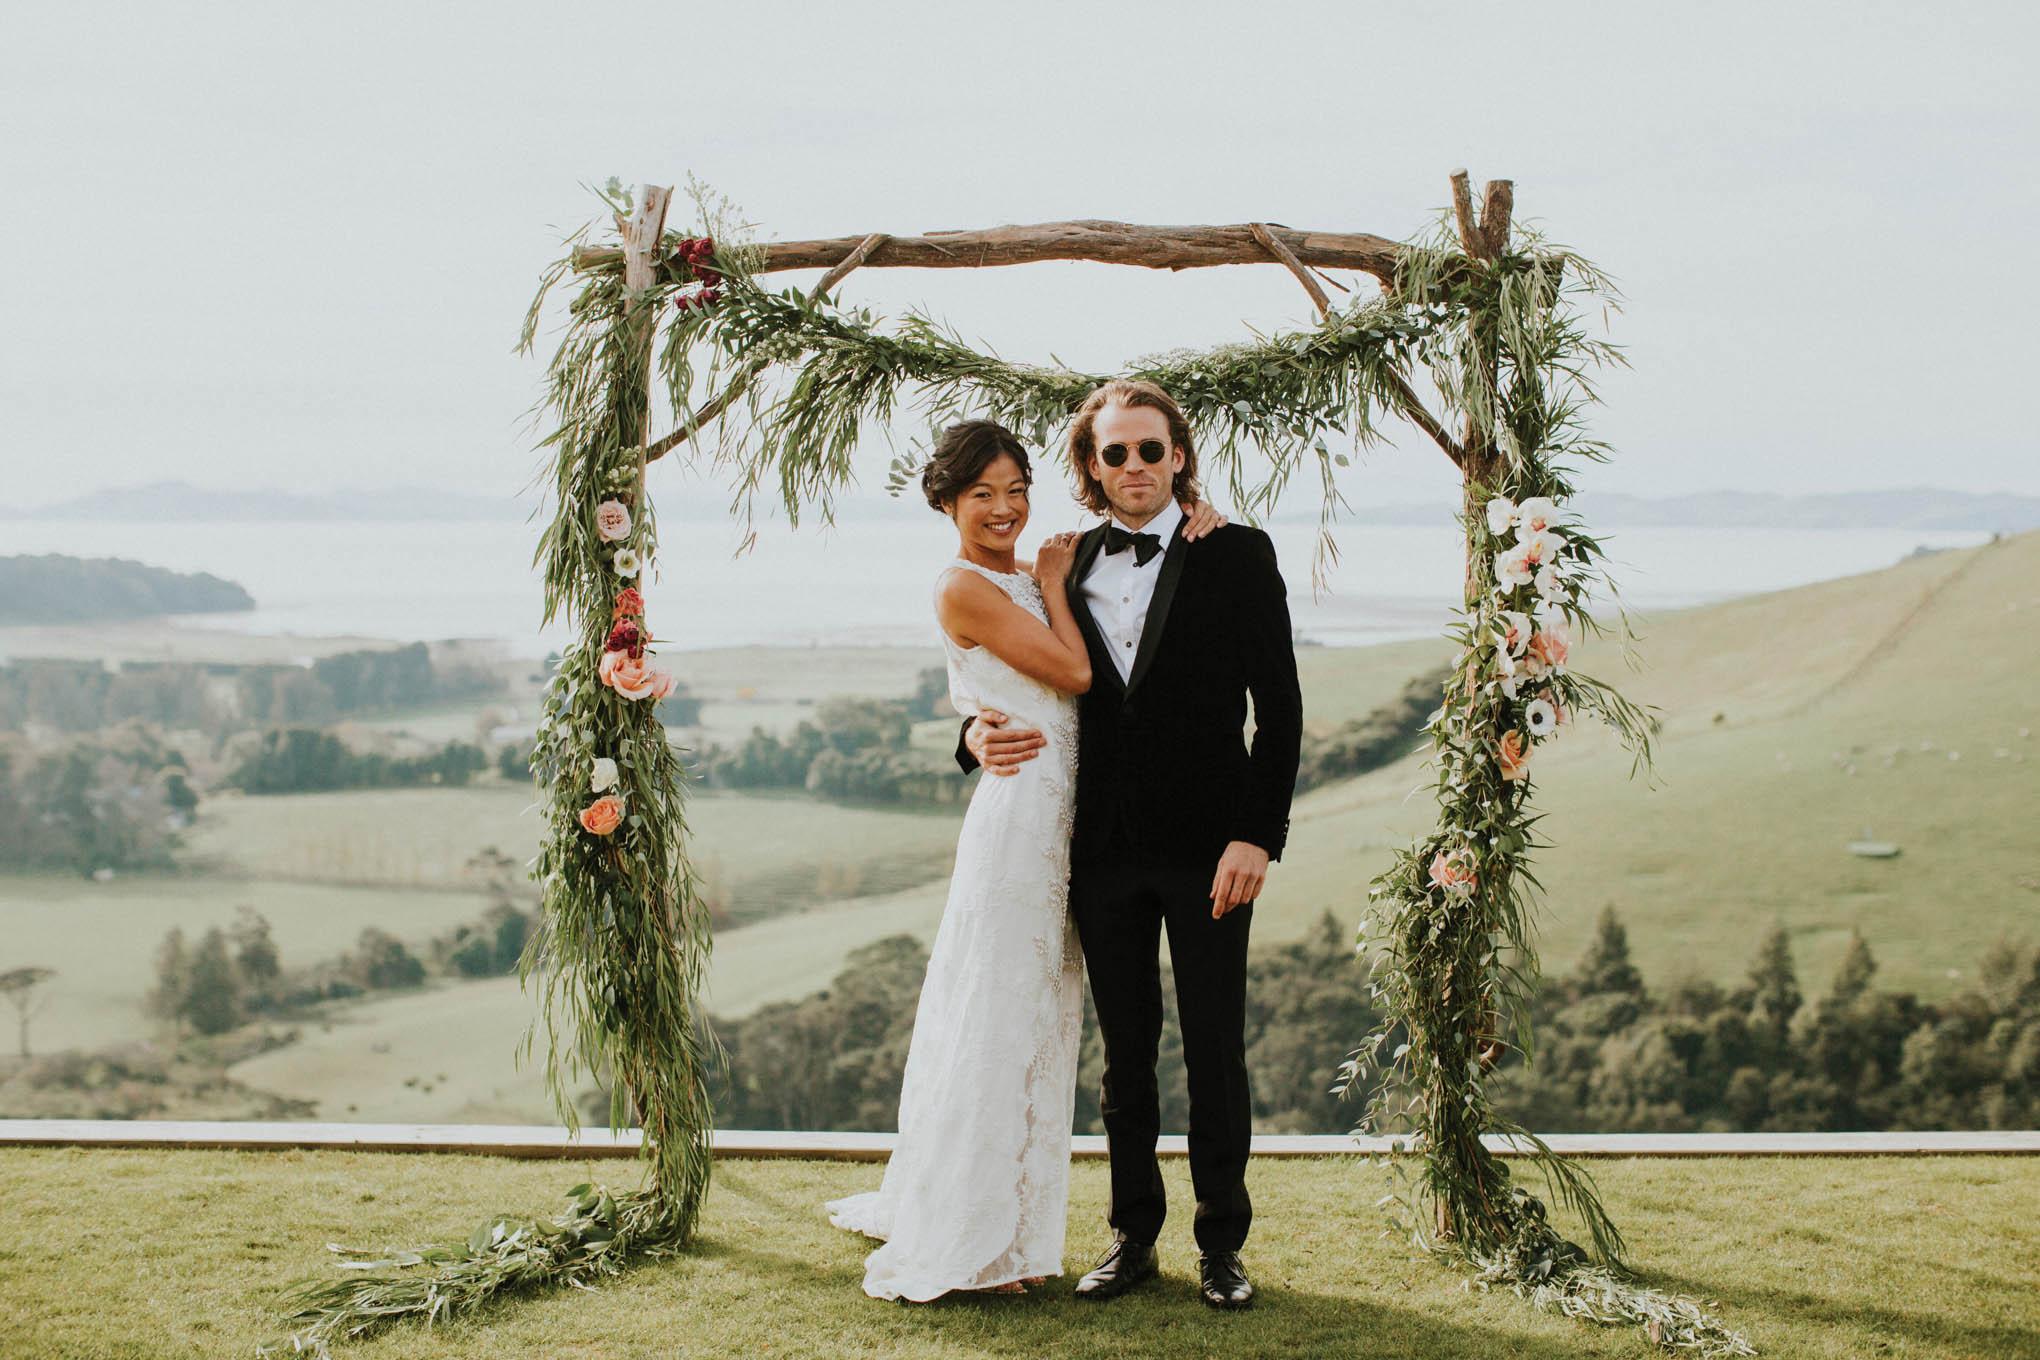 Categories: Weddings-Real Wedding: Steph & Josh - Photography by Anna Kidman